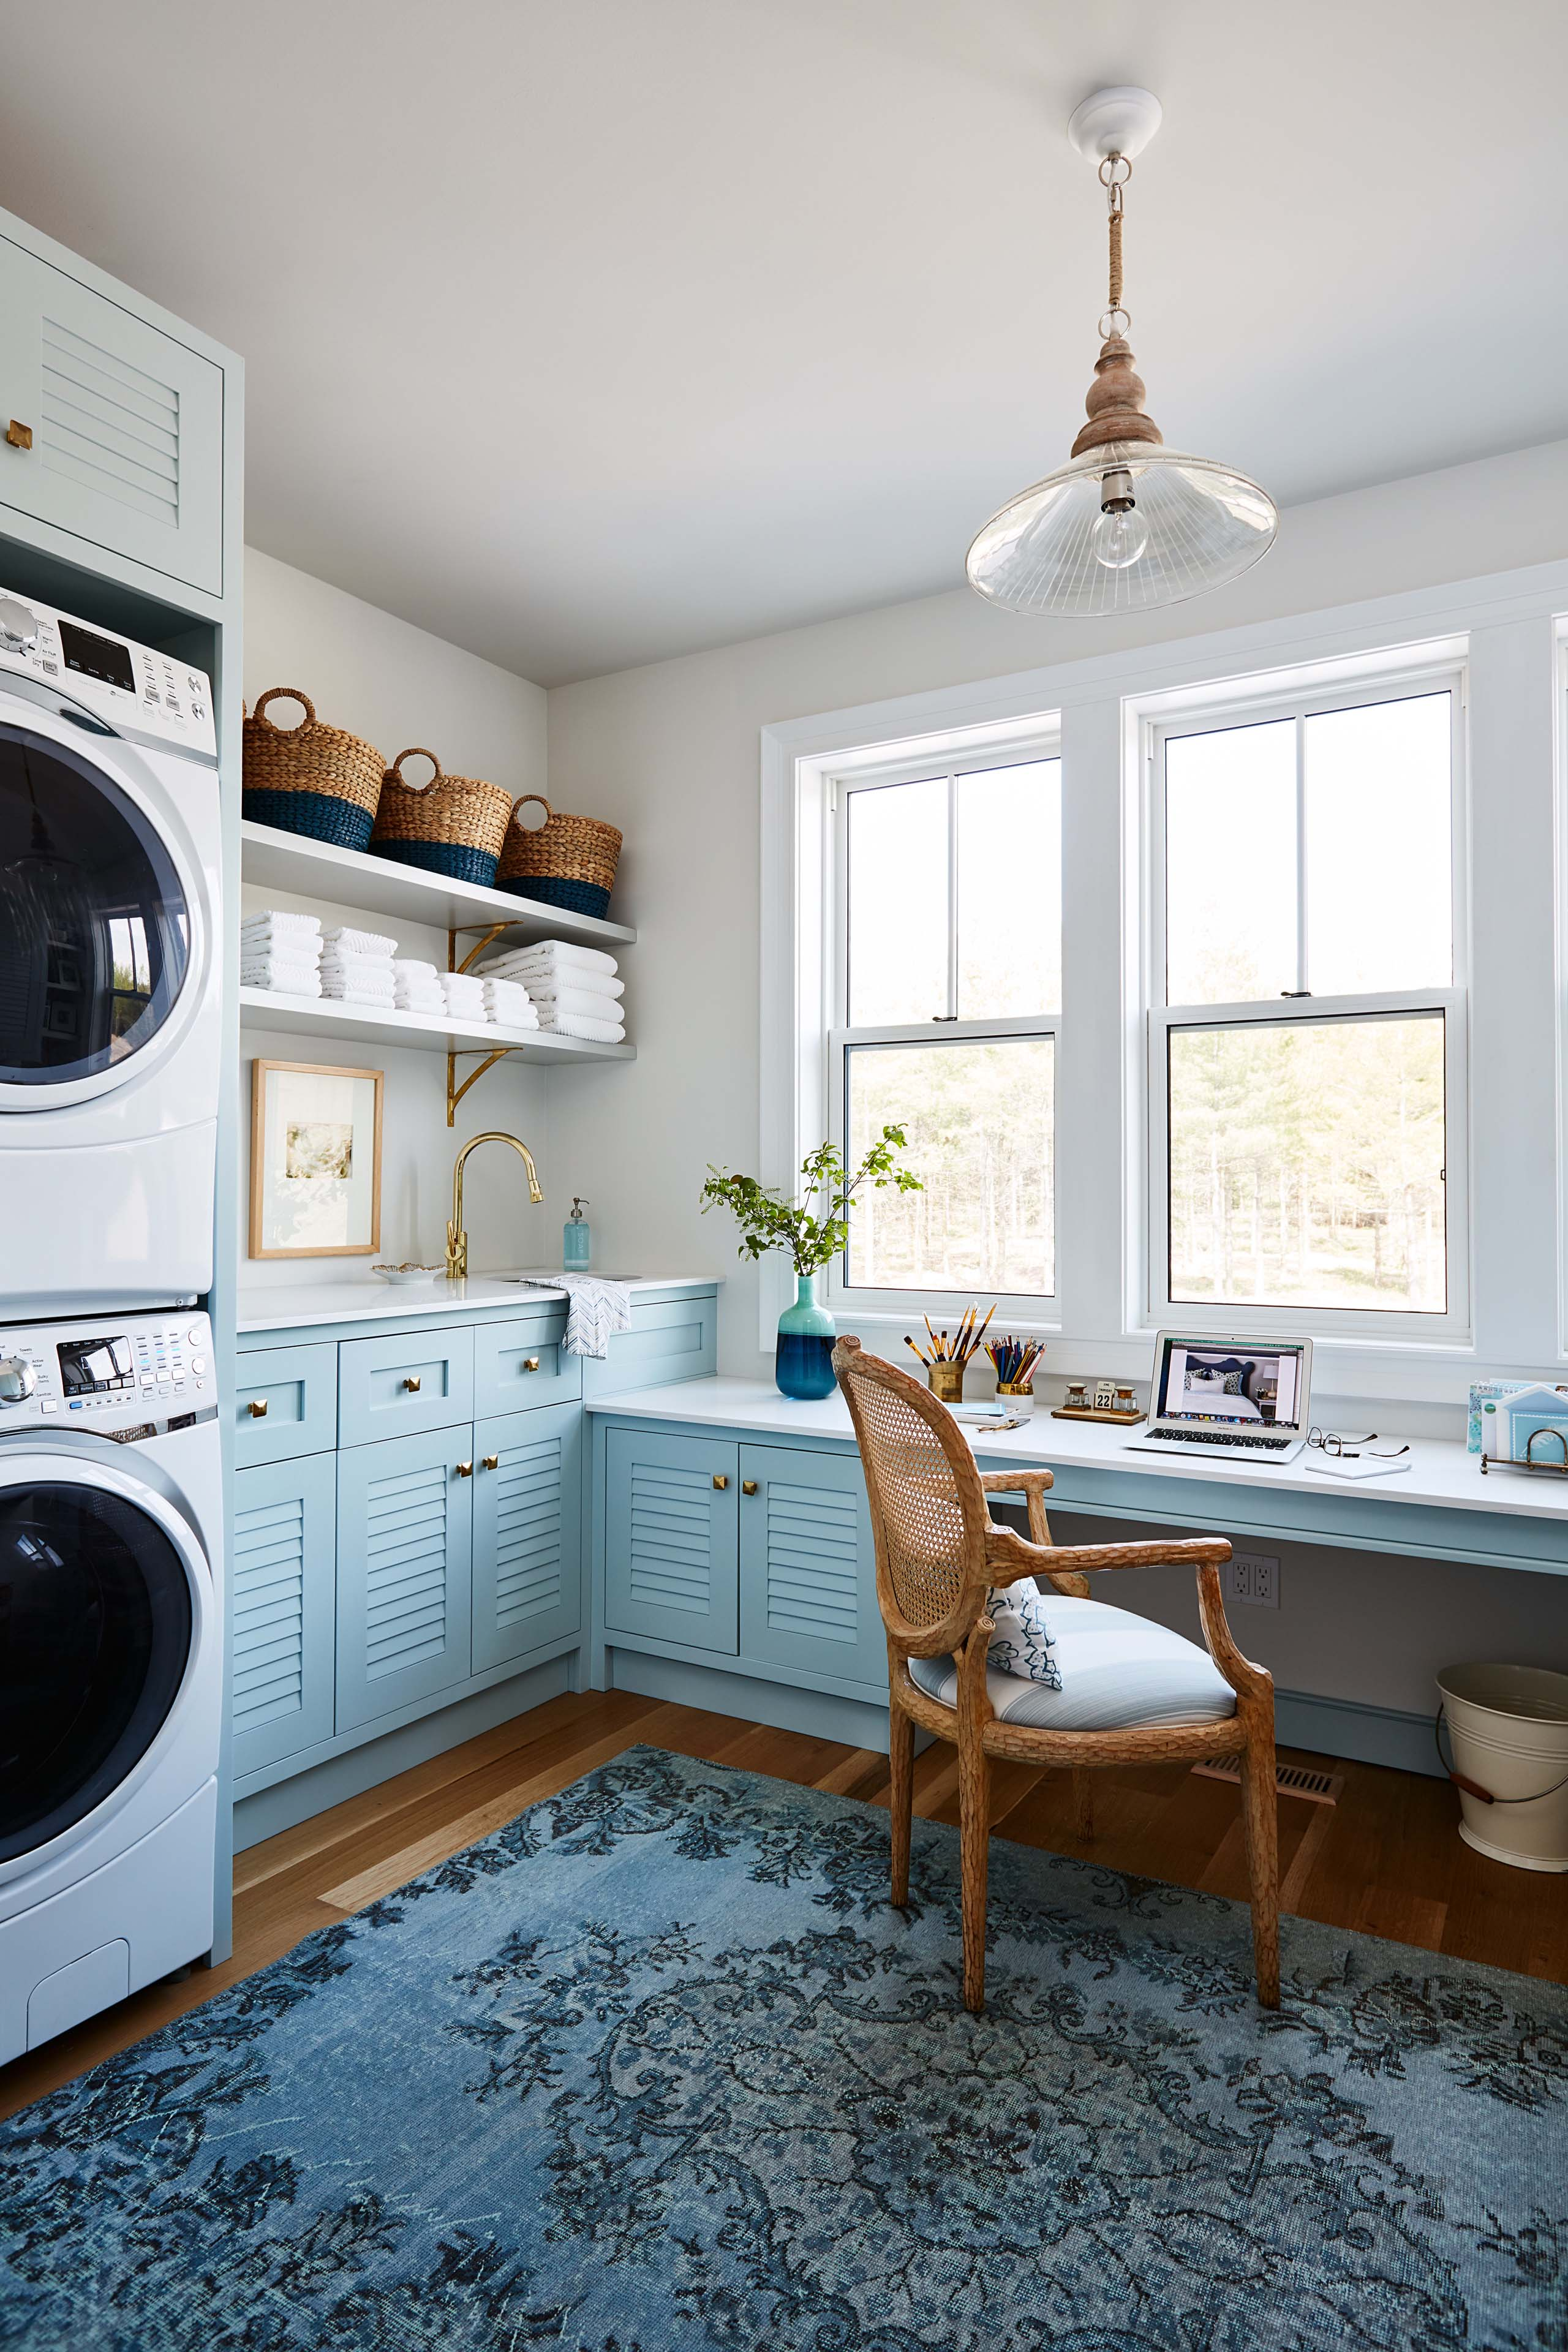 Blue and white laundry room by #SarahRicharson. #louveredcabinet #plantationcabinets